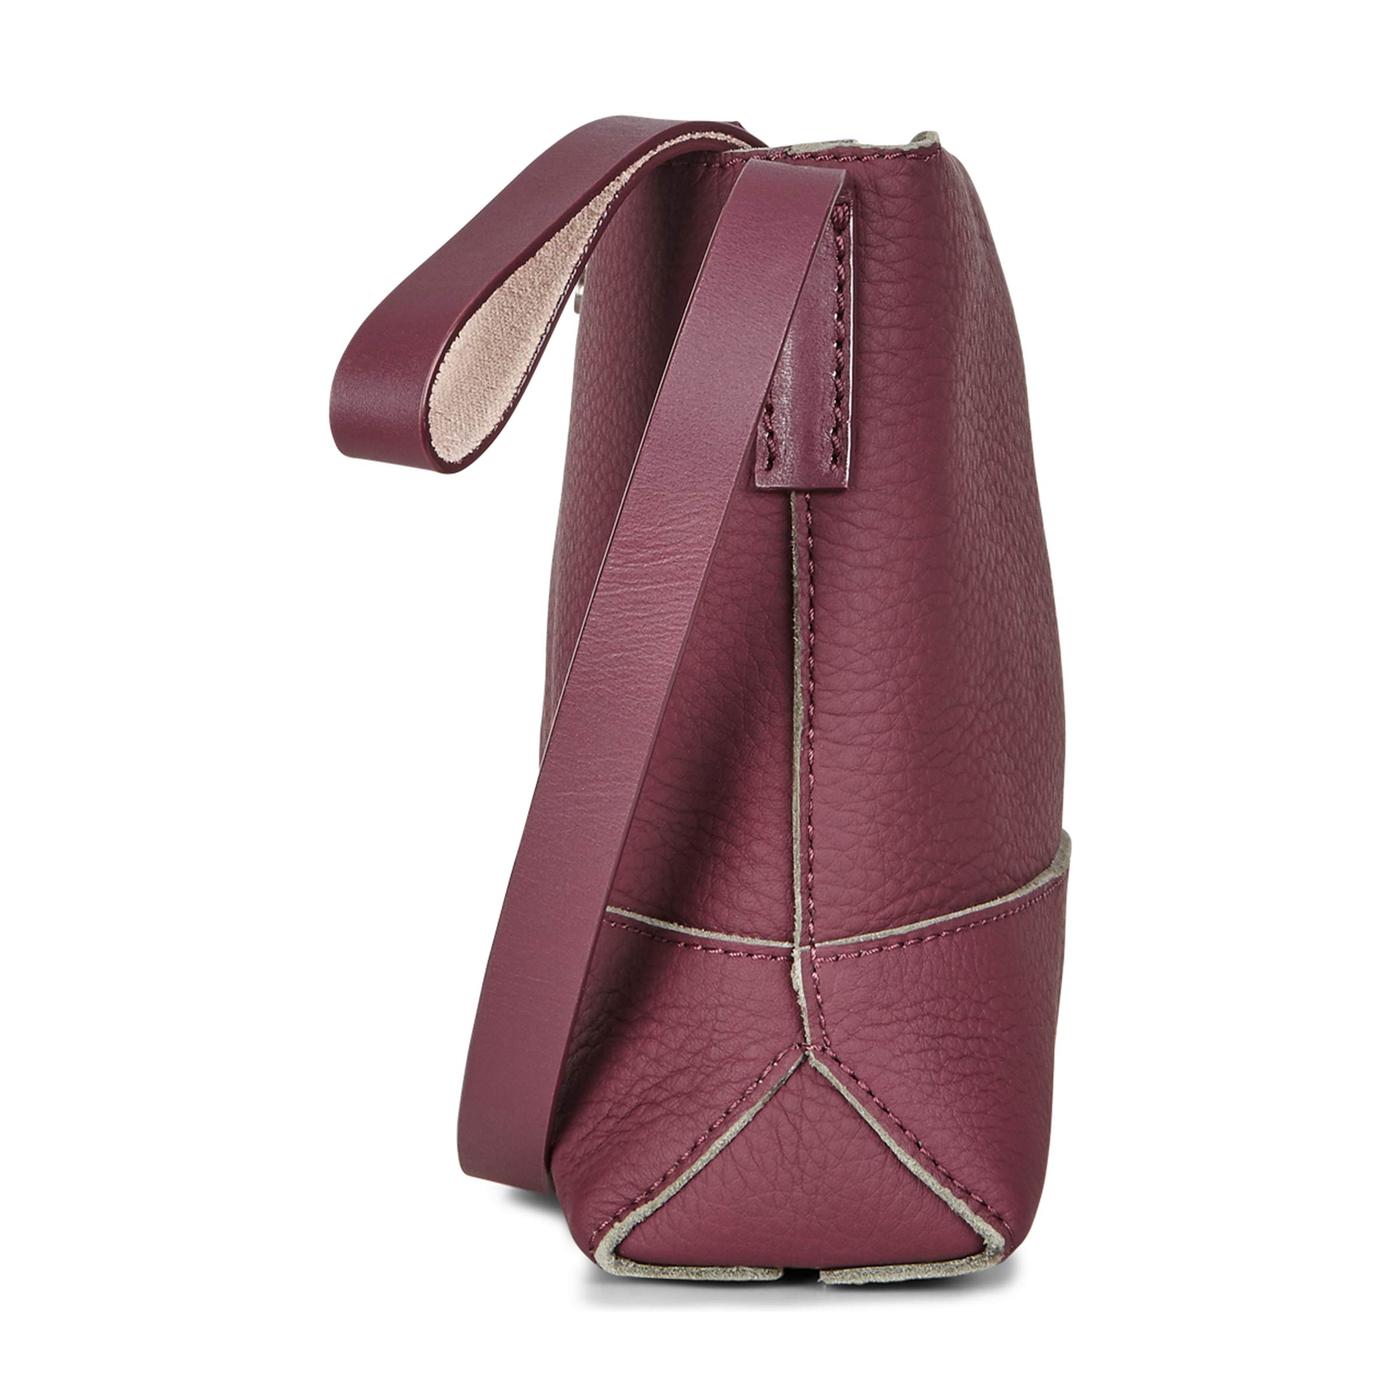 ECCO JILIN TANDEM Small Crossbody Bag